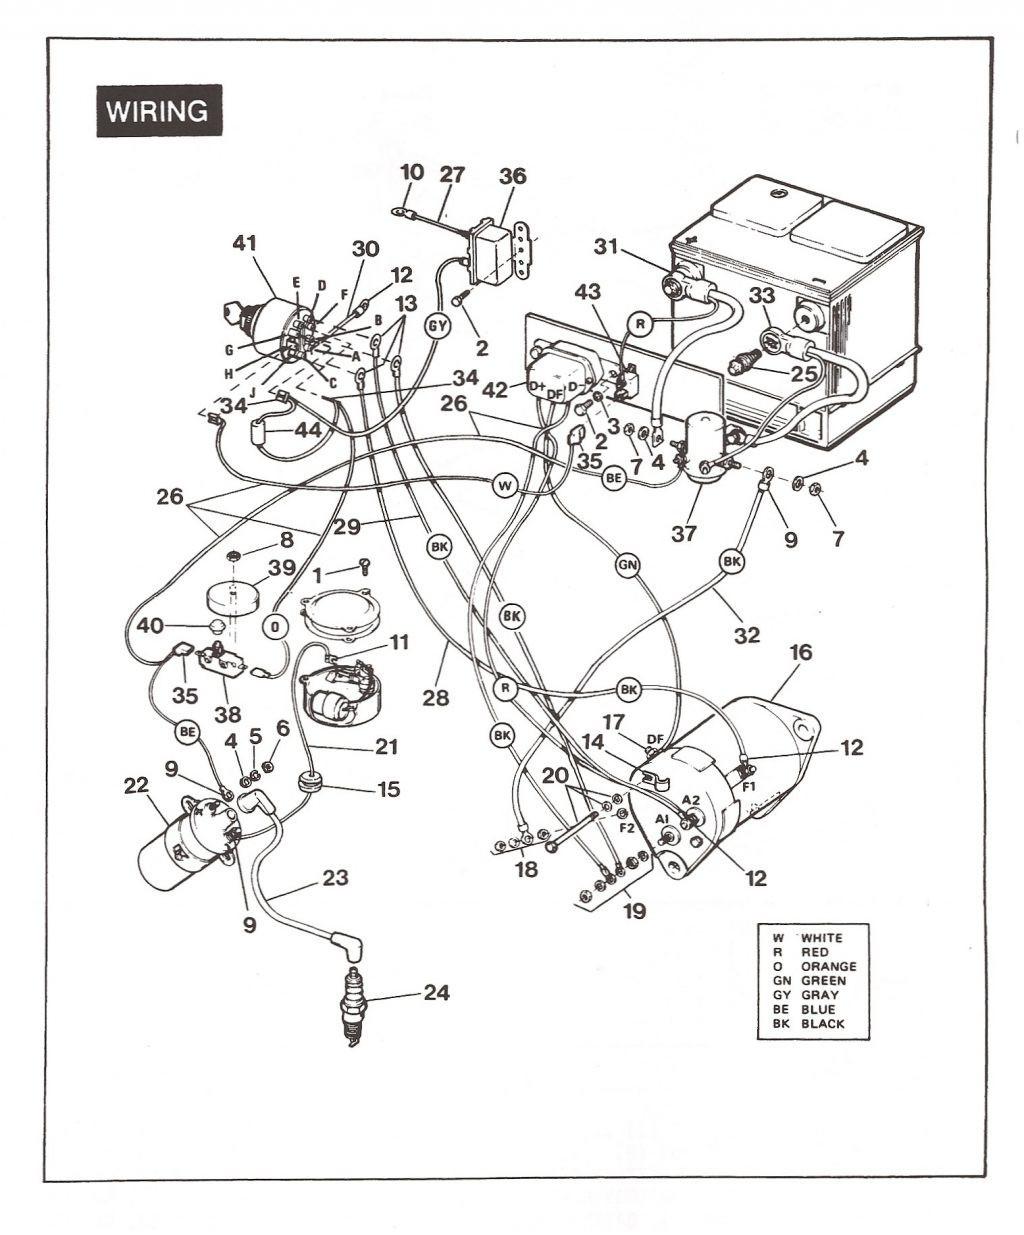 98 Ez Go Wiring Diagram Pdf | Wiring Diagram - Ez Go Golf Cart Wiring Diagram Pdf